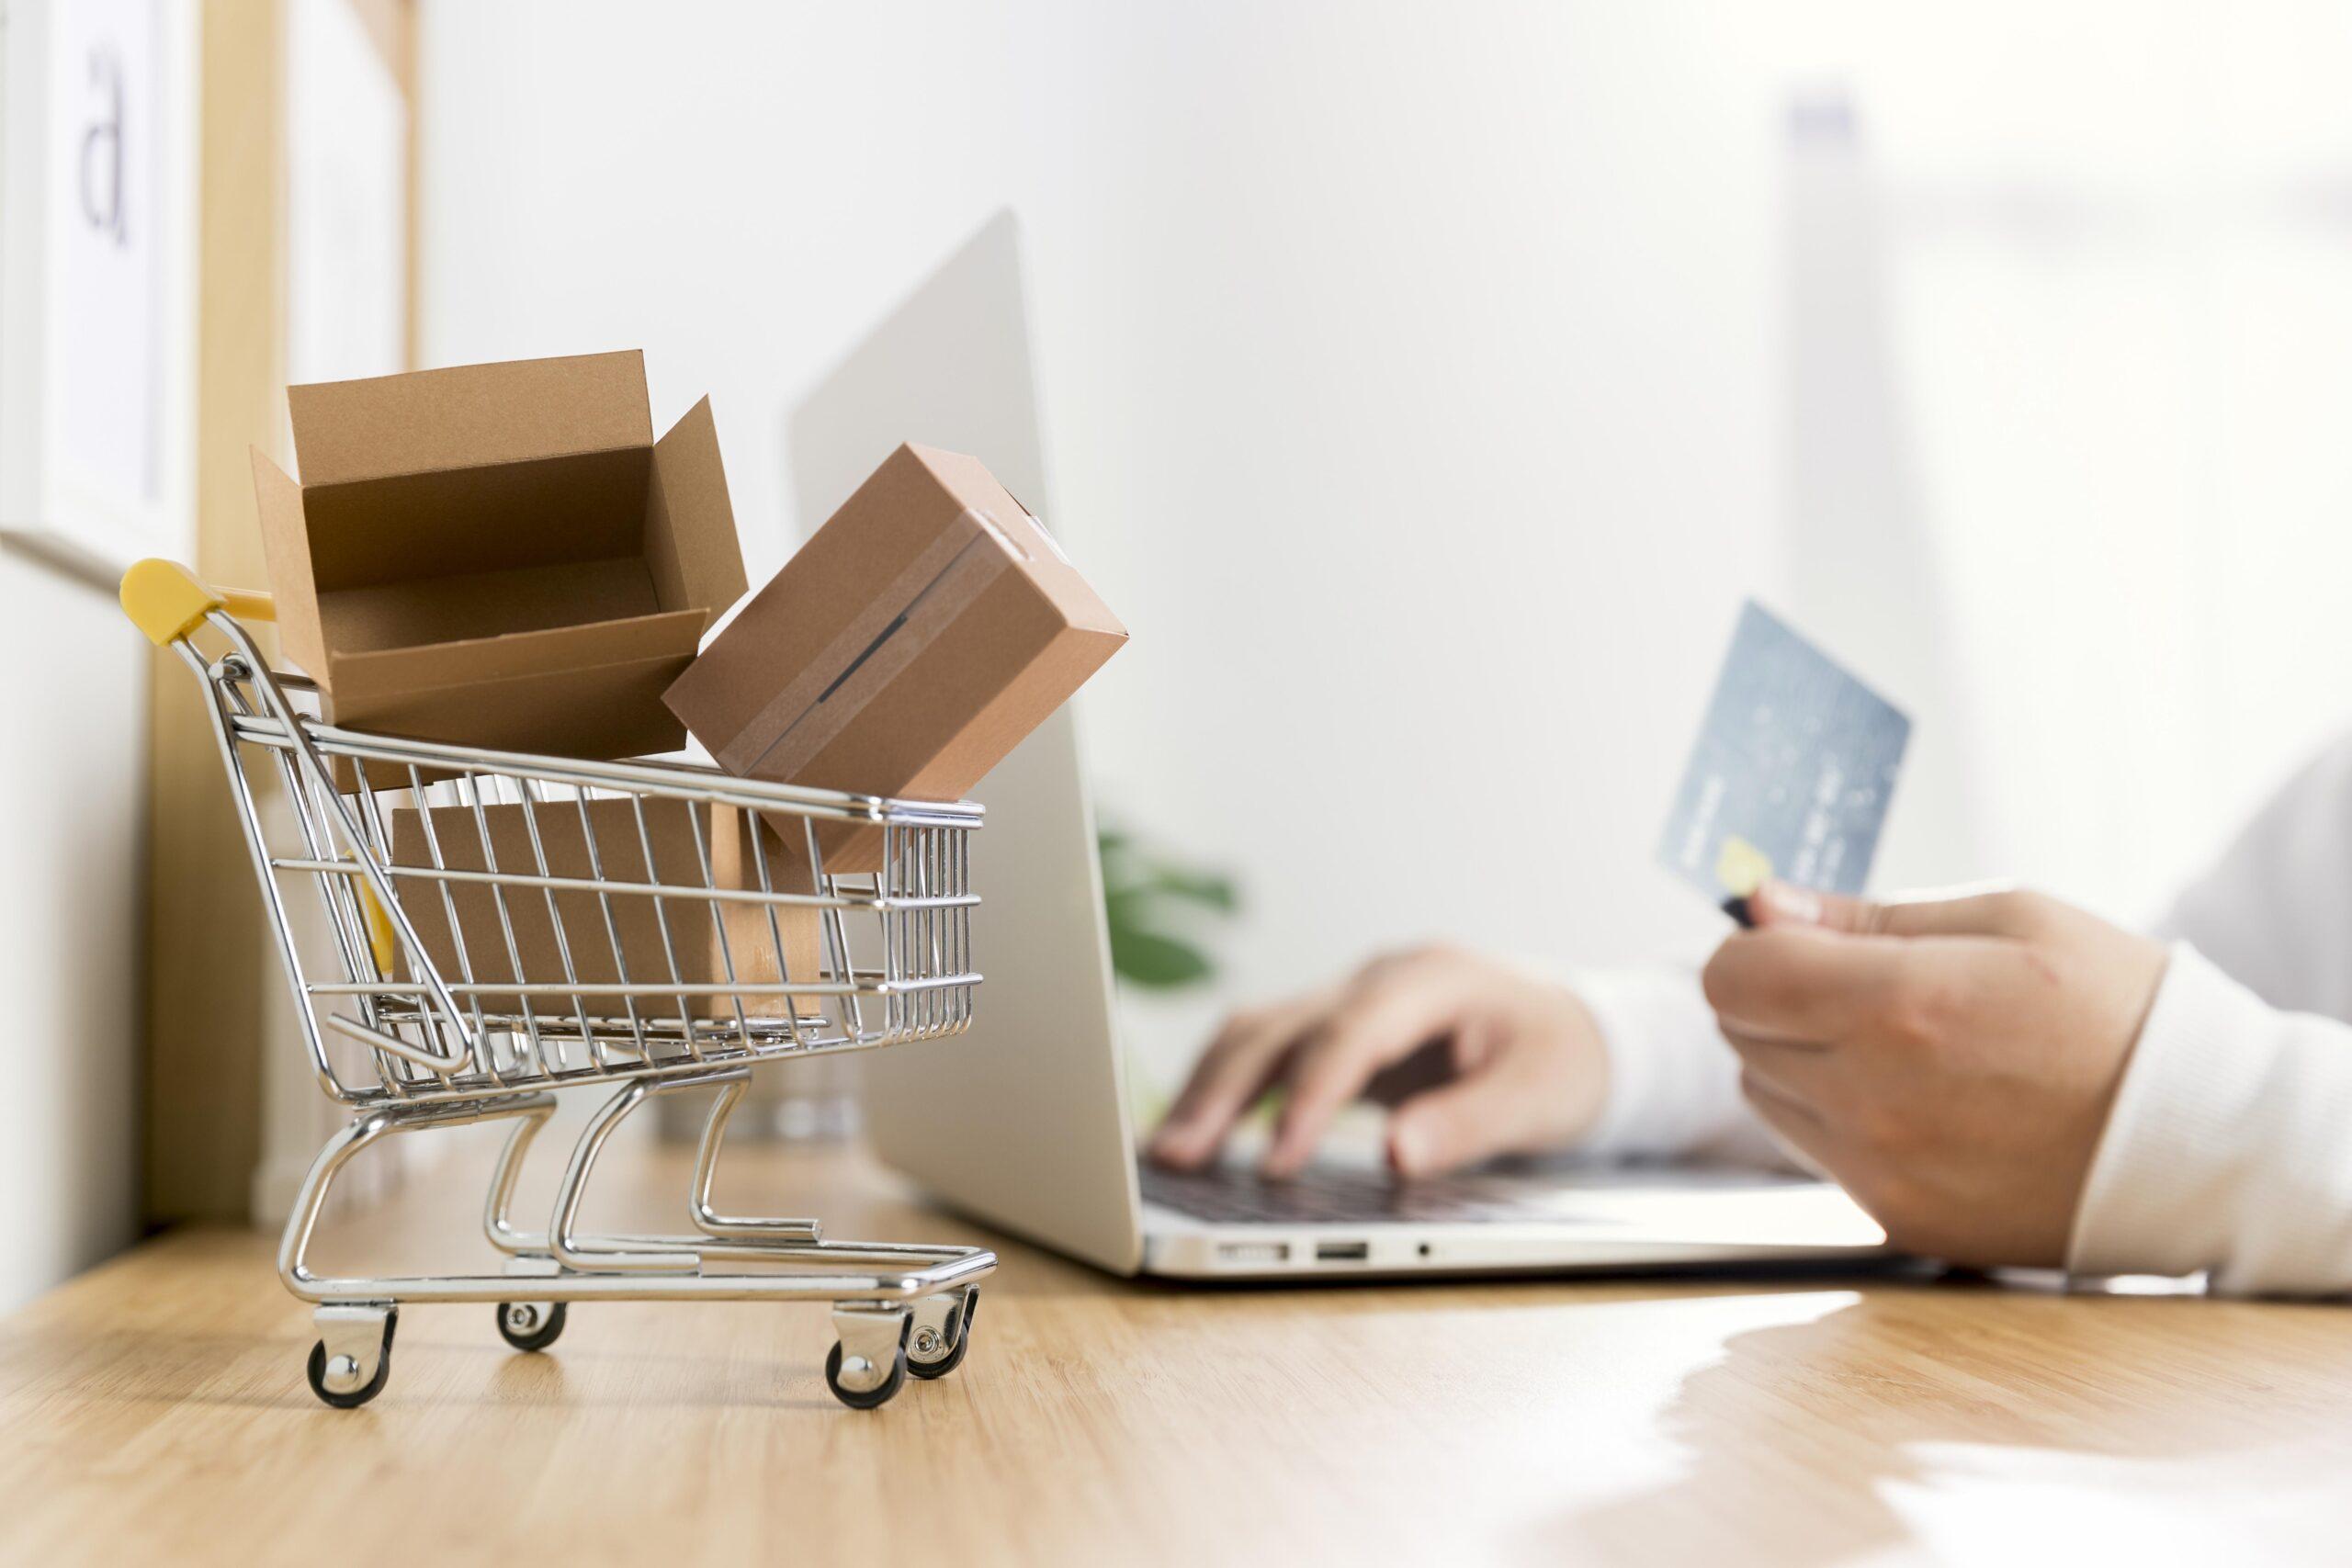 cross-border-retailers-in-Europe-2020-online-shopping-cart